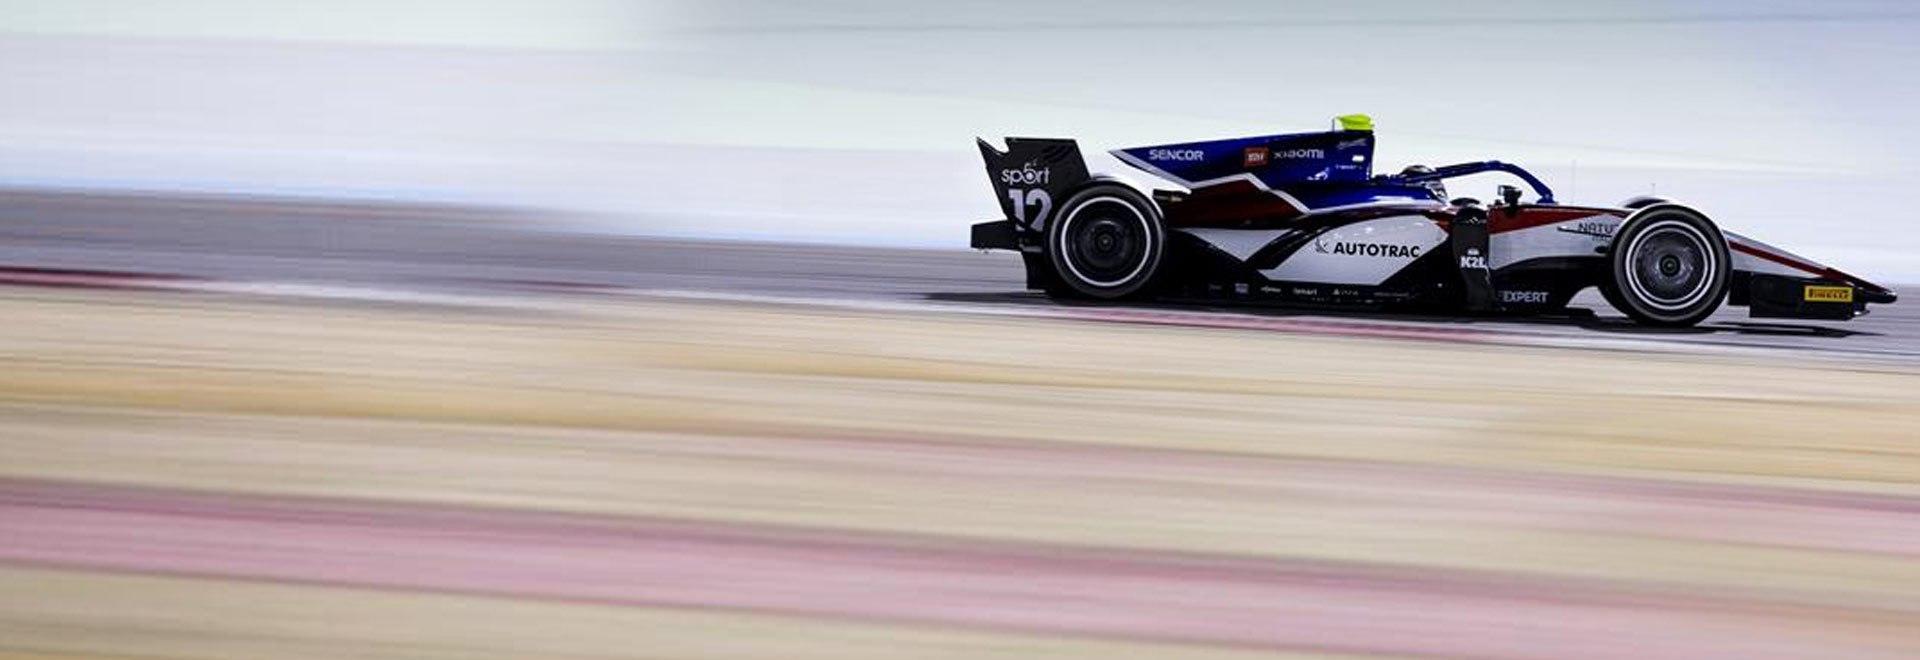 GP Russia. Sprint Race